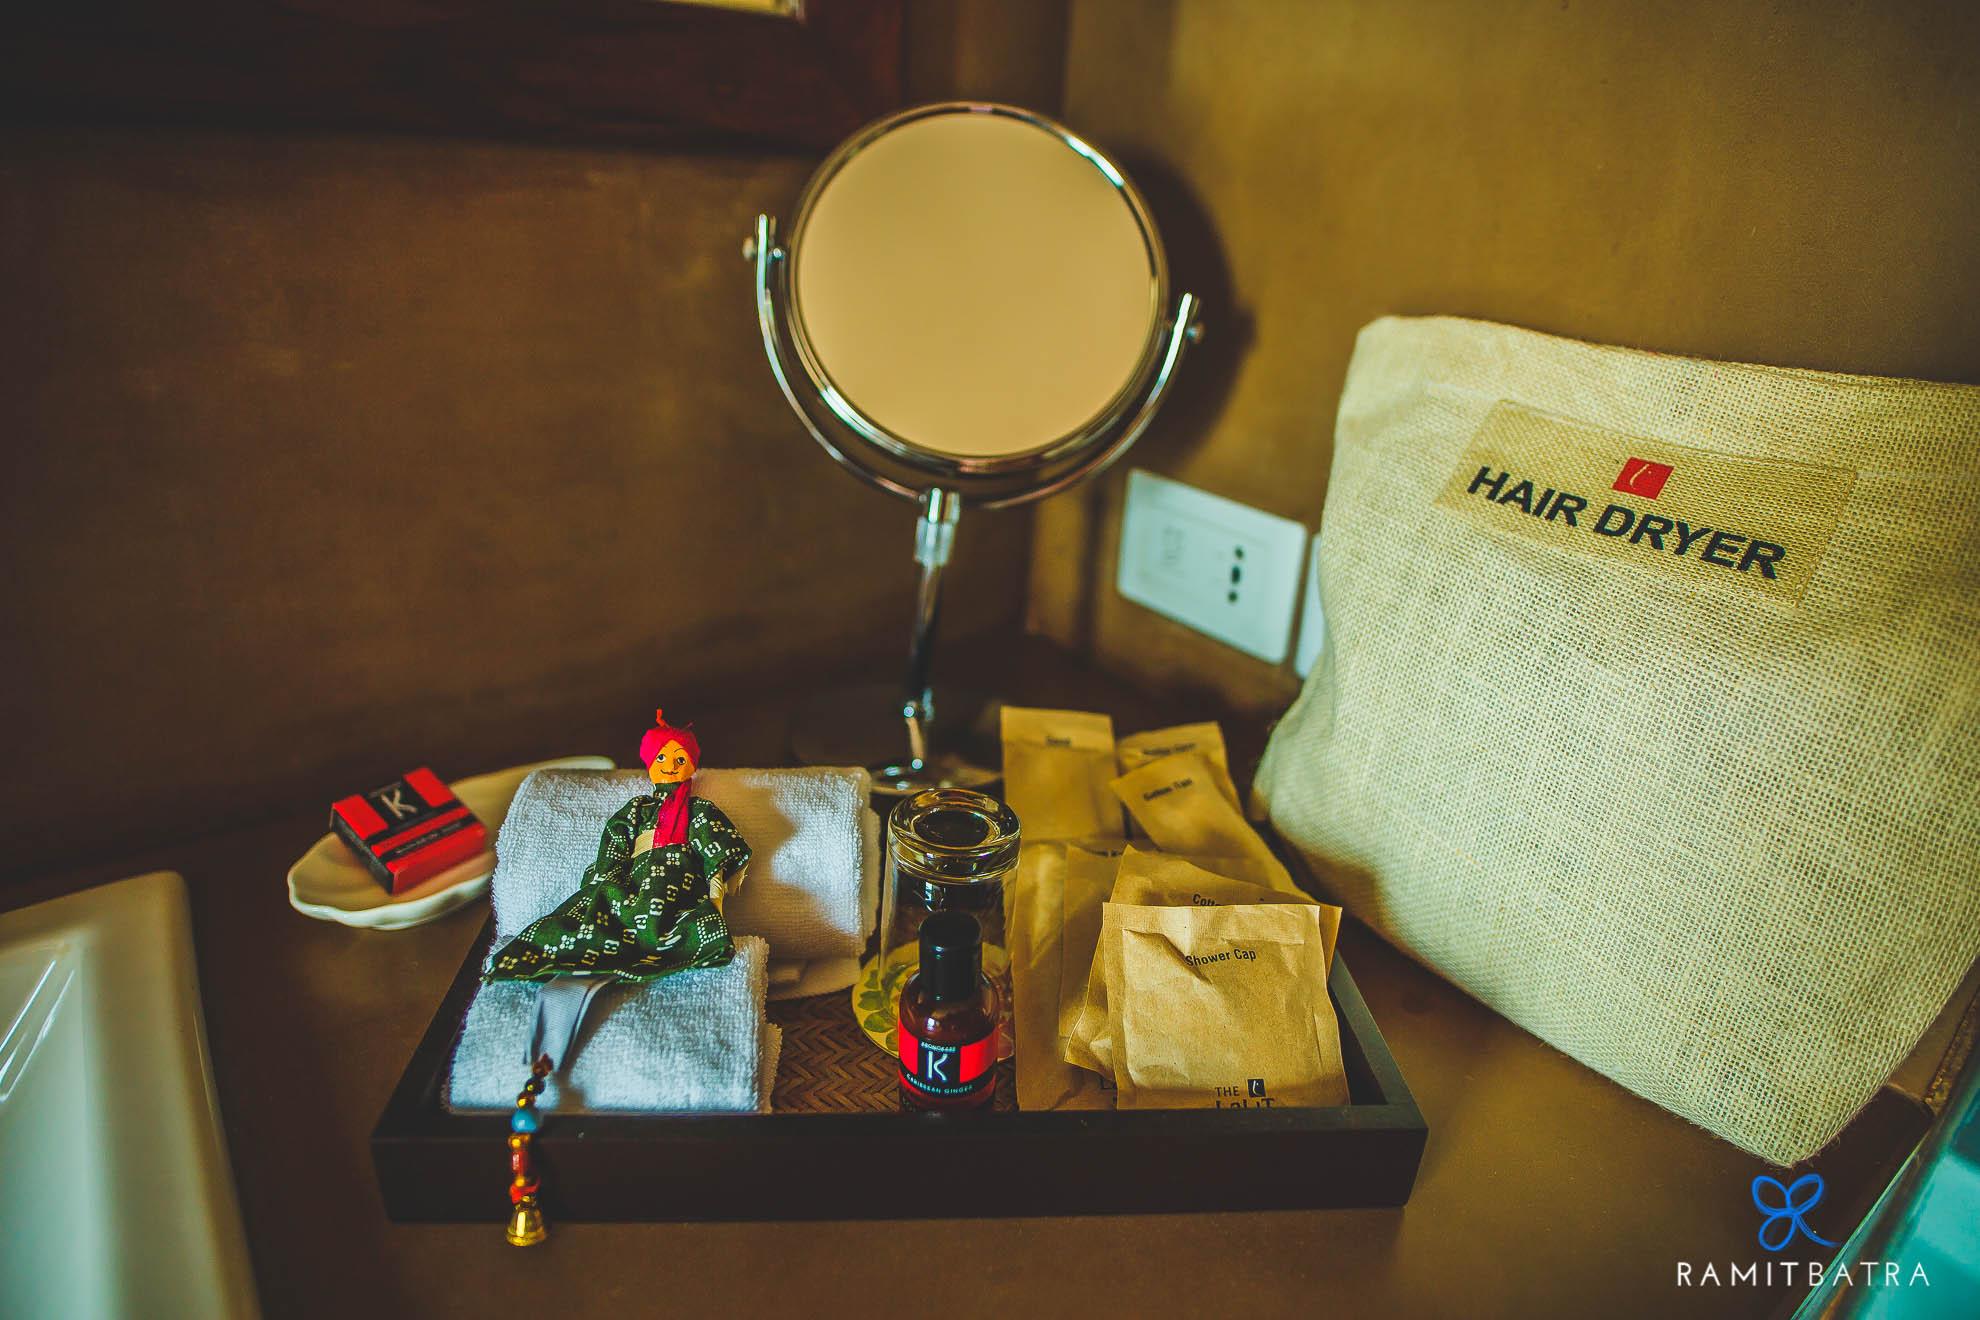 lalit-mangar-hotel-near-delhi-ramitbatra-009